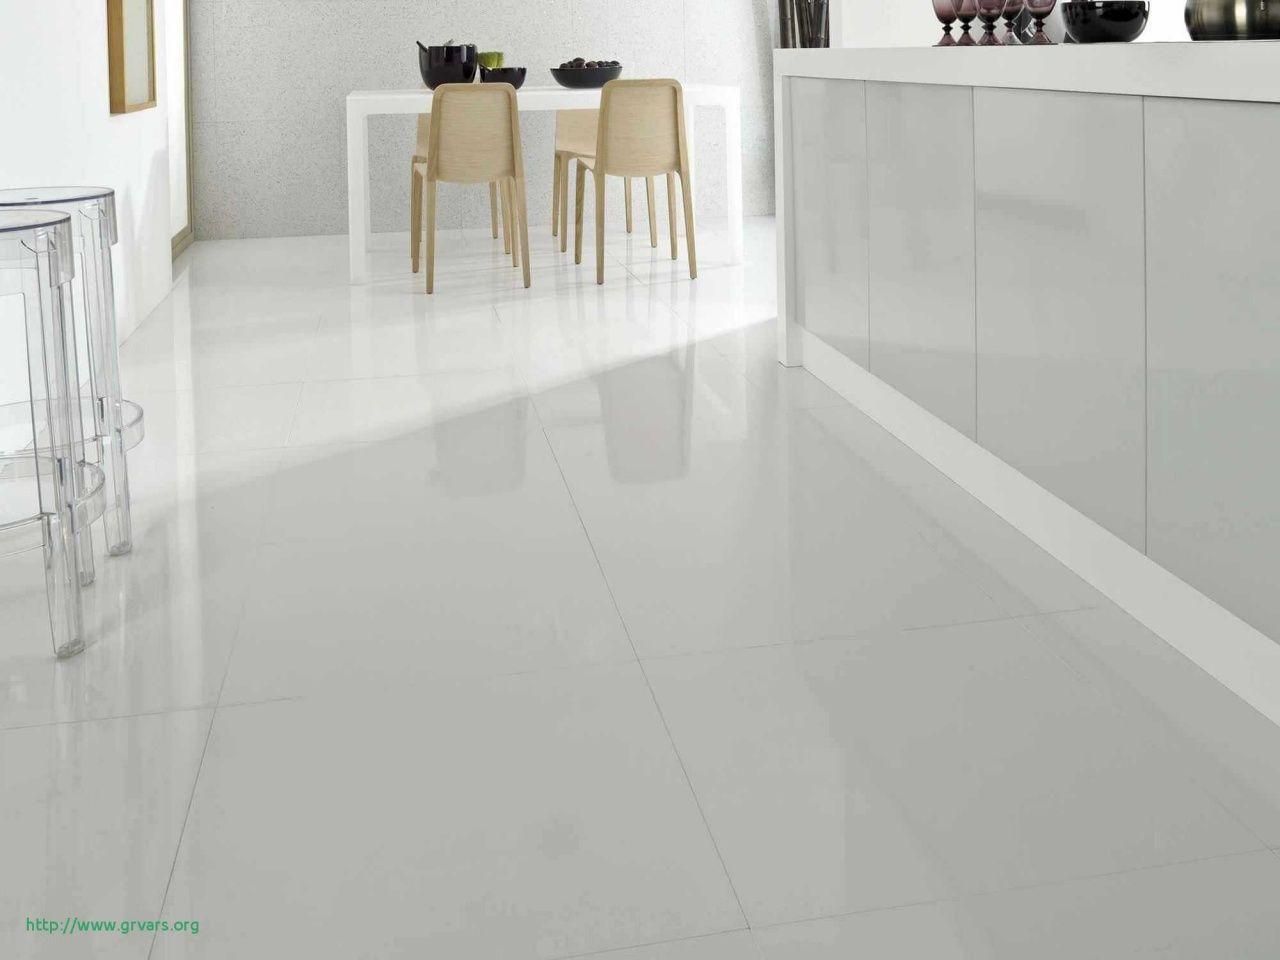 Average Cost To Install Tile Flooring In 2020 Installing Tile Floor Grey Vinyl Plank Flooring Installing Hardwood Floors